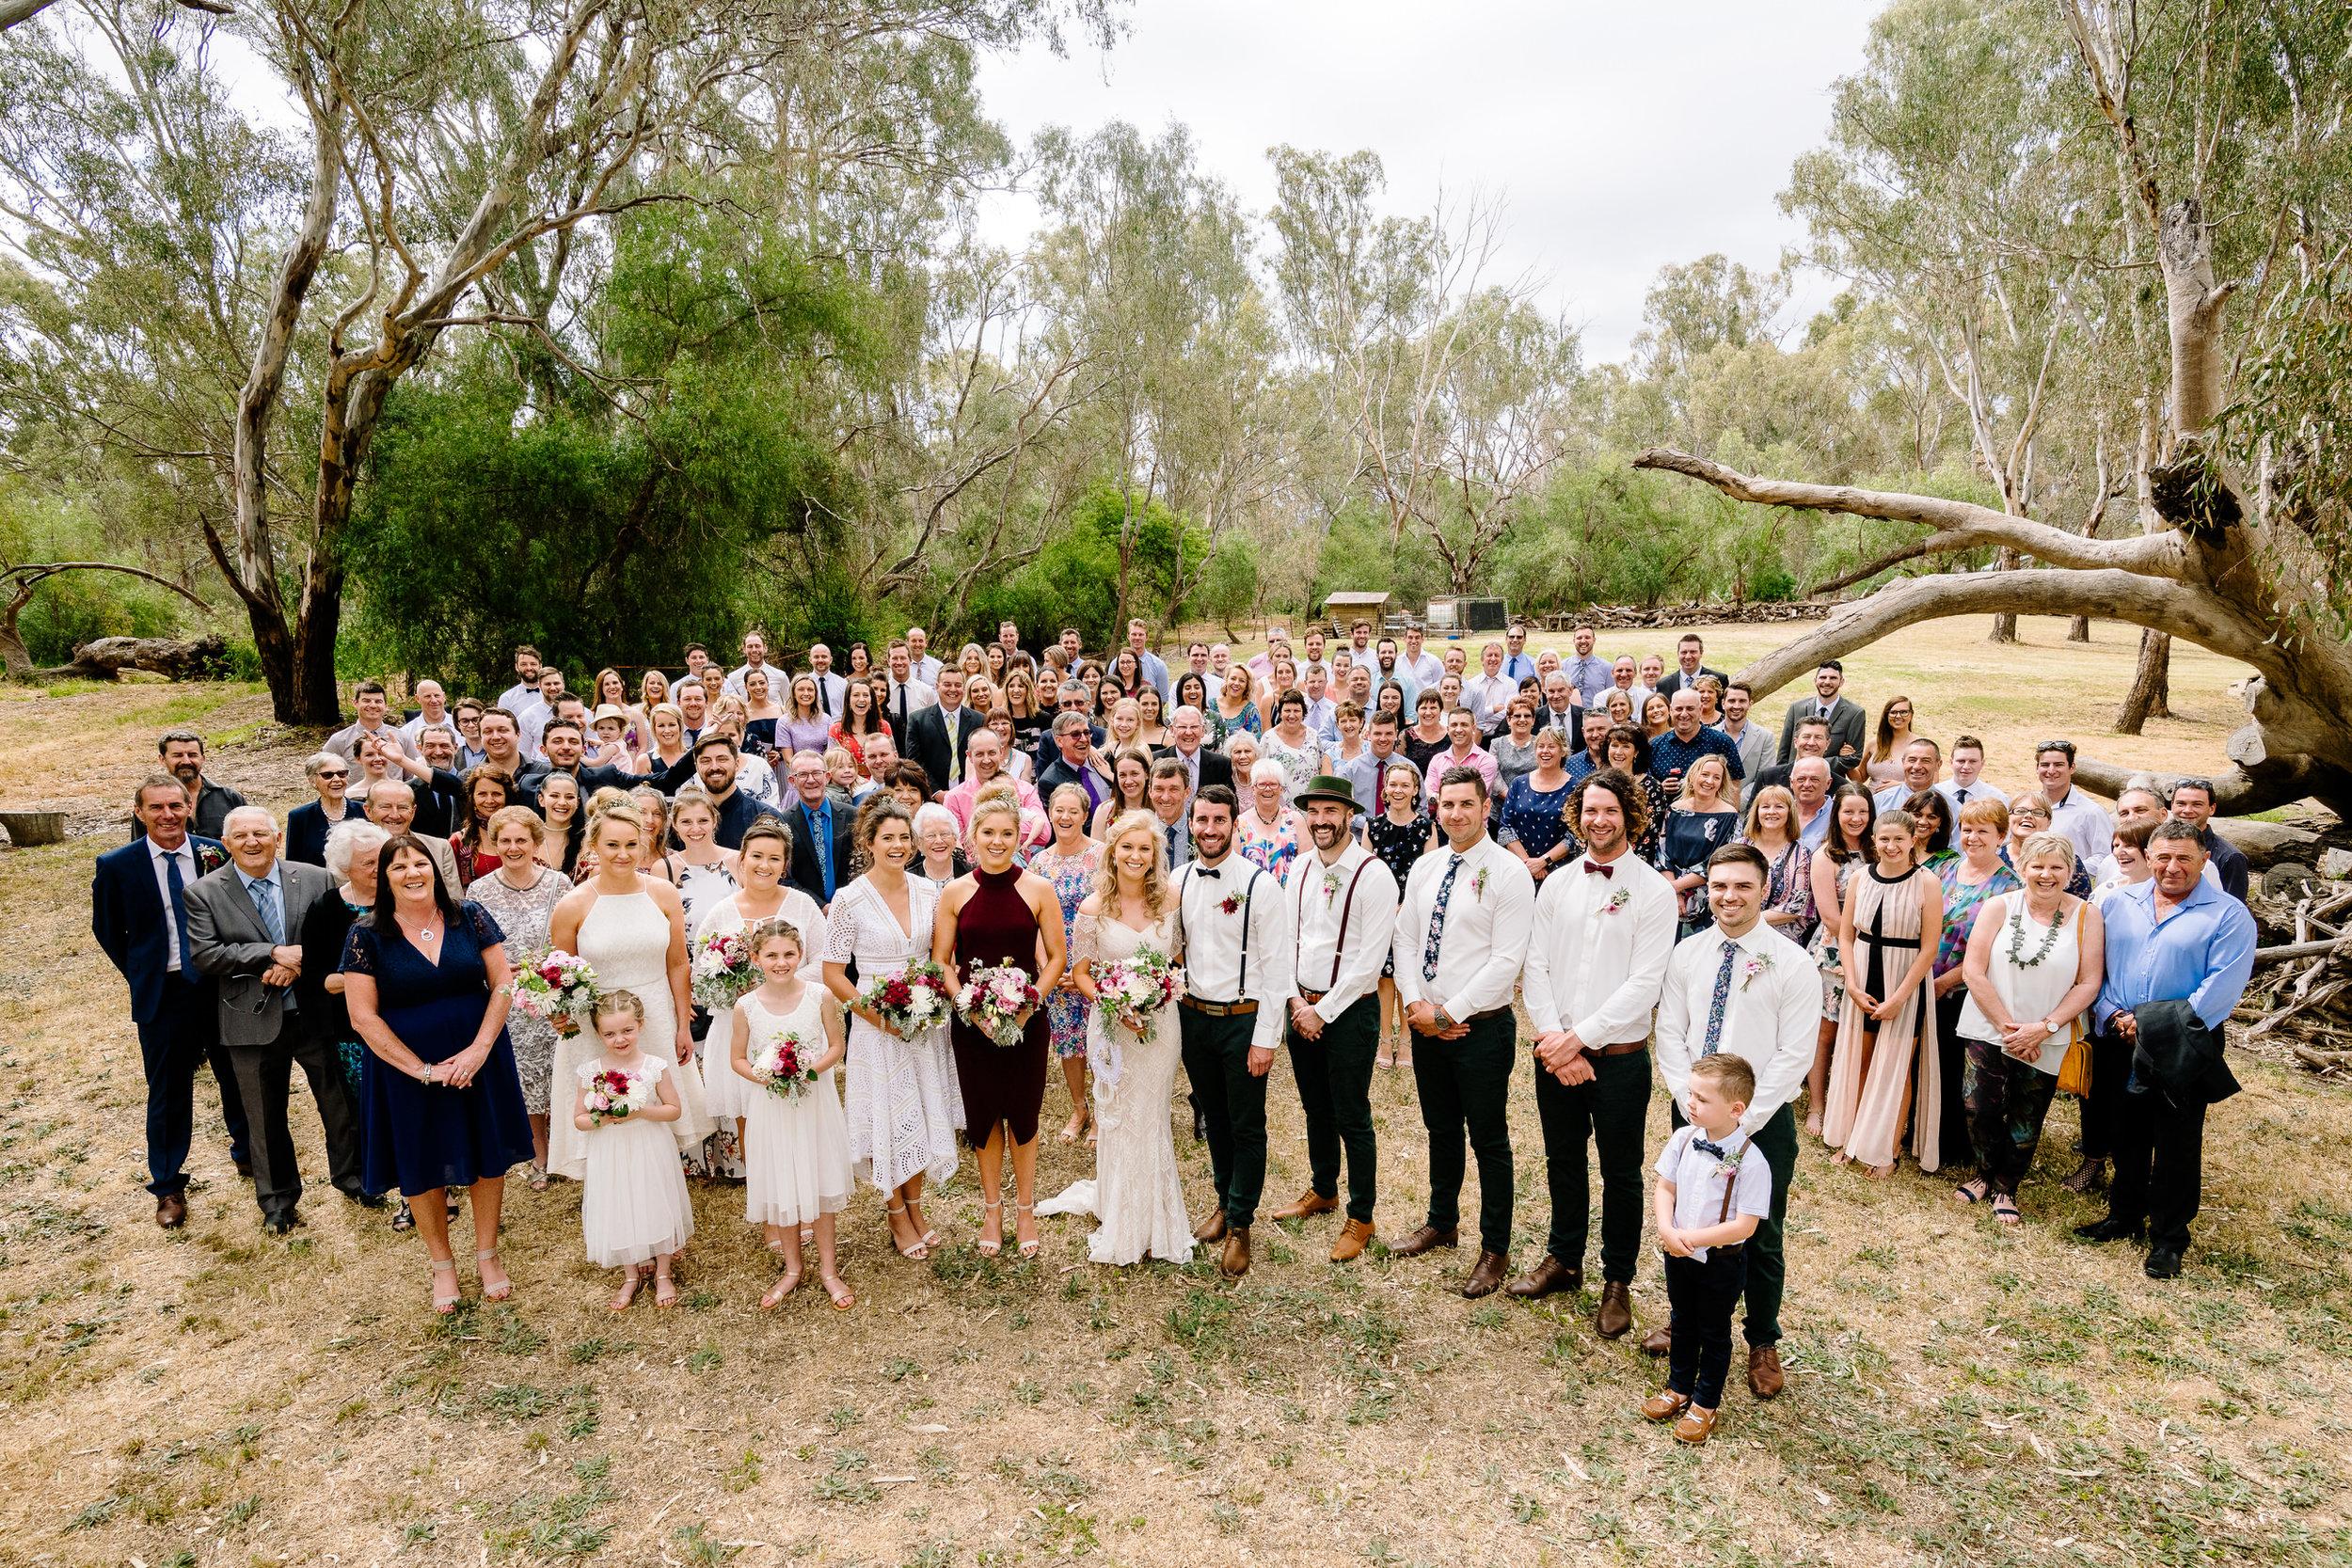 Justin_And_Jim_Photography_Backyard_Wedding184.JPG